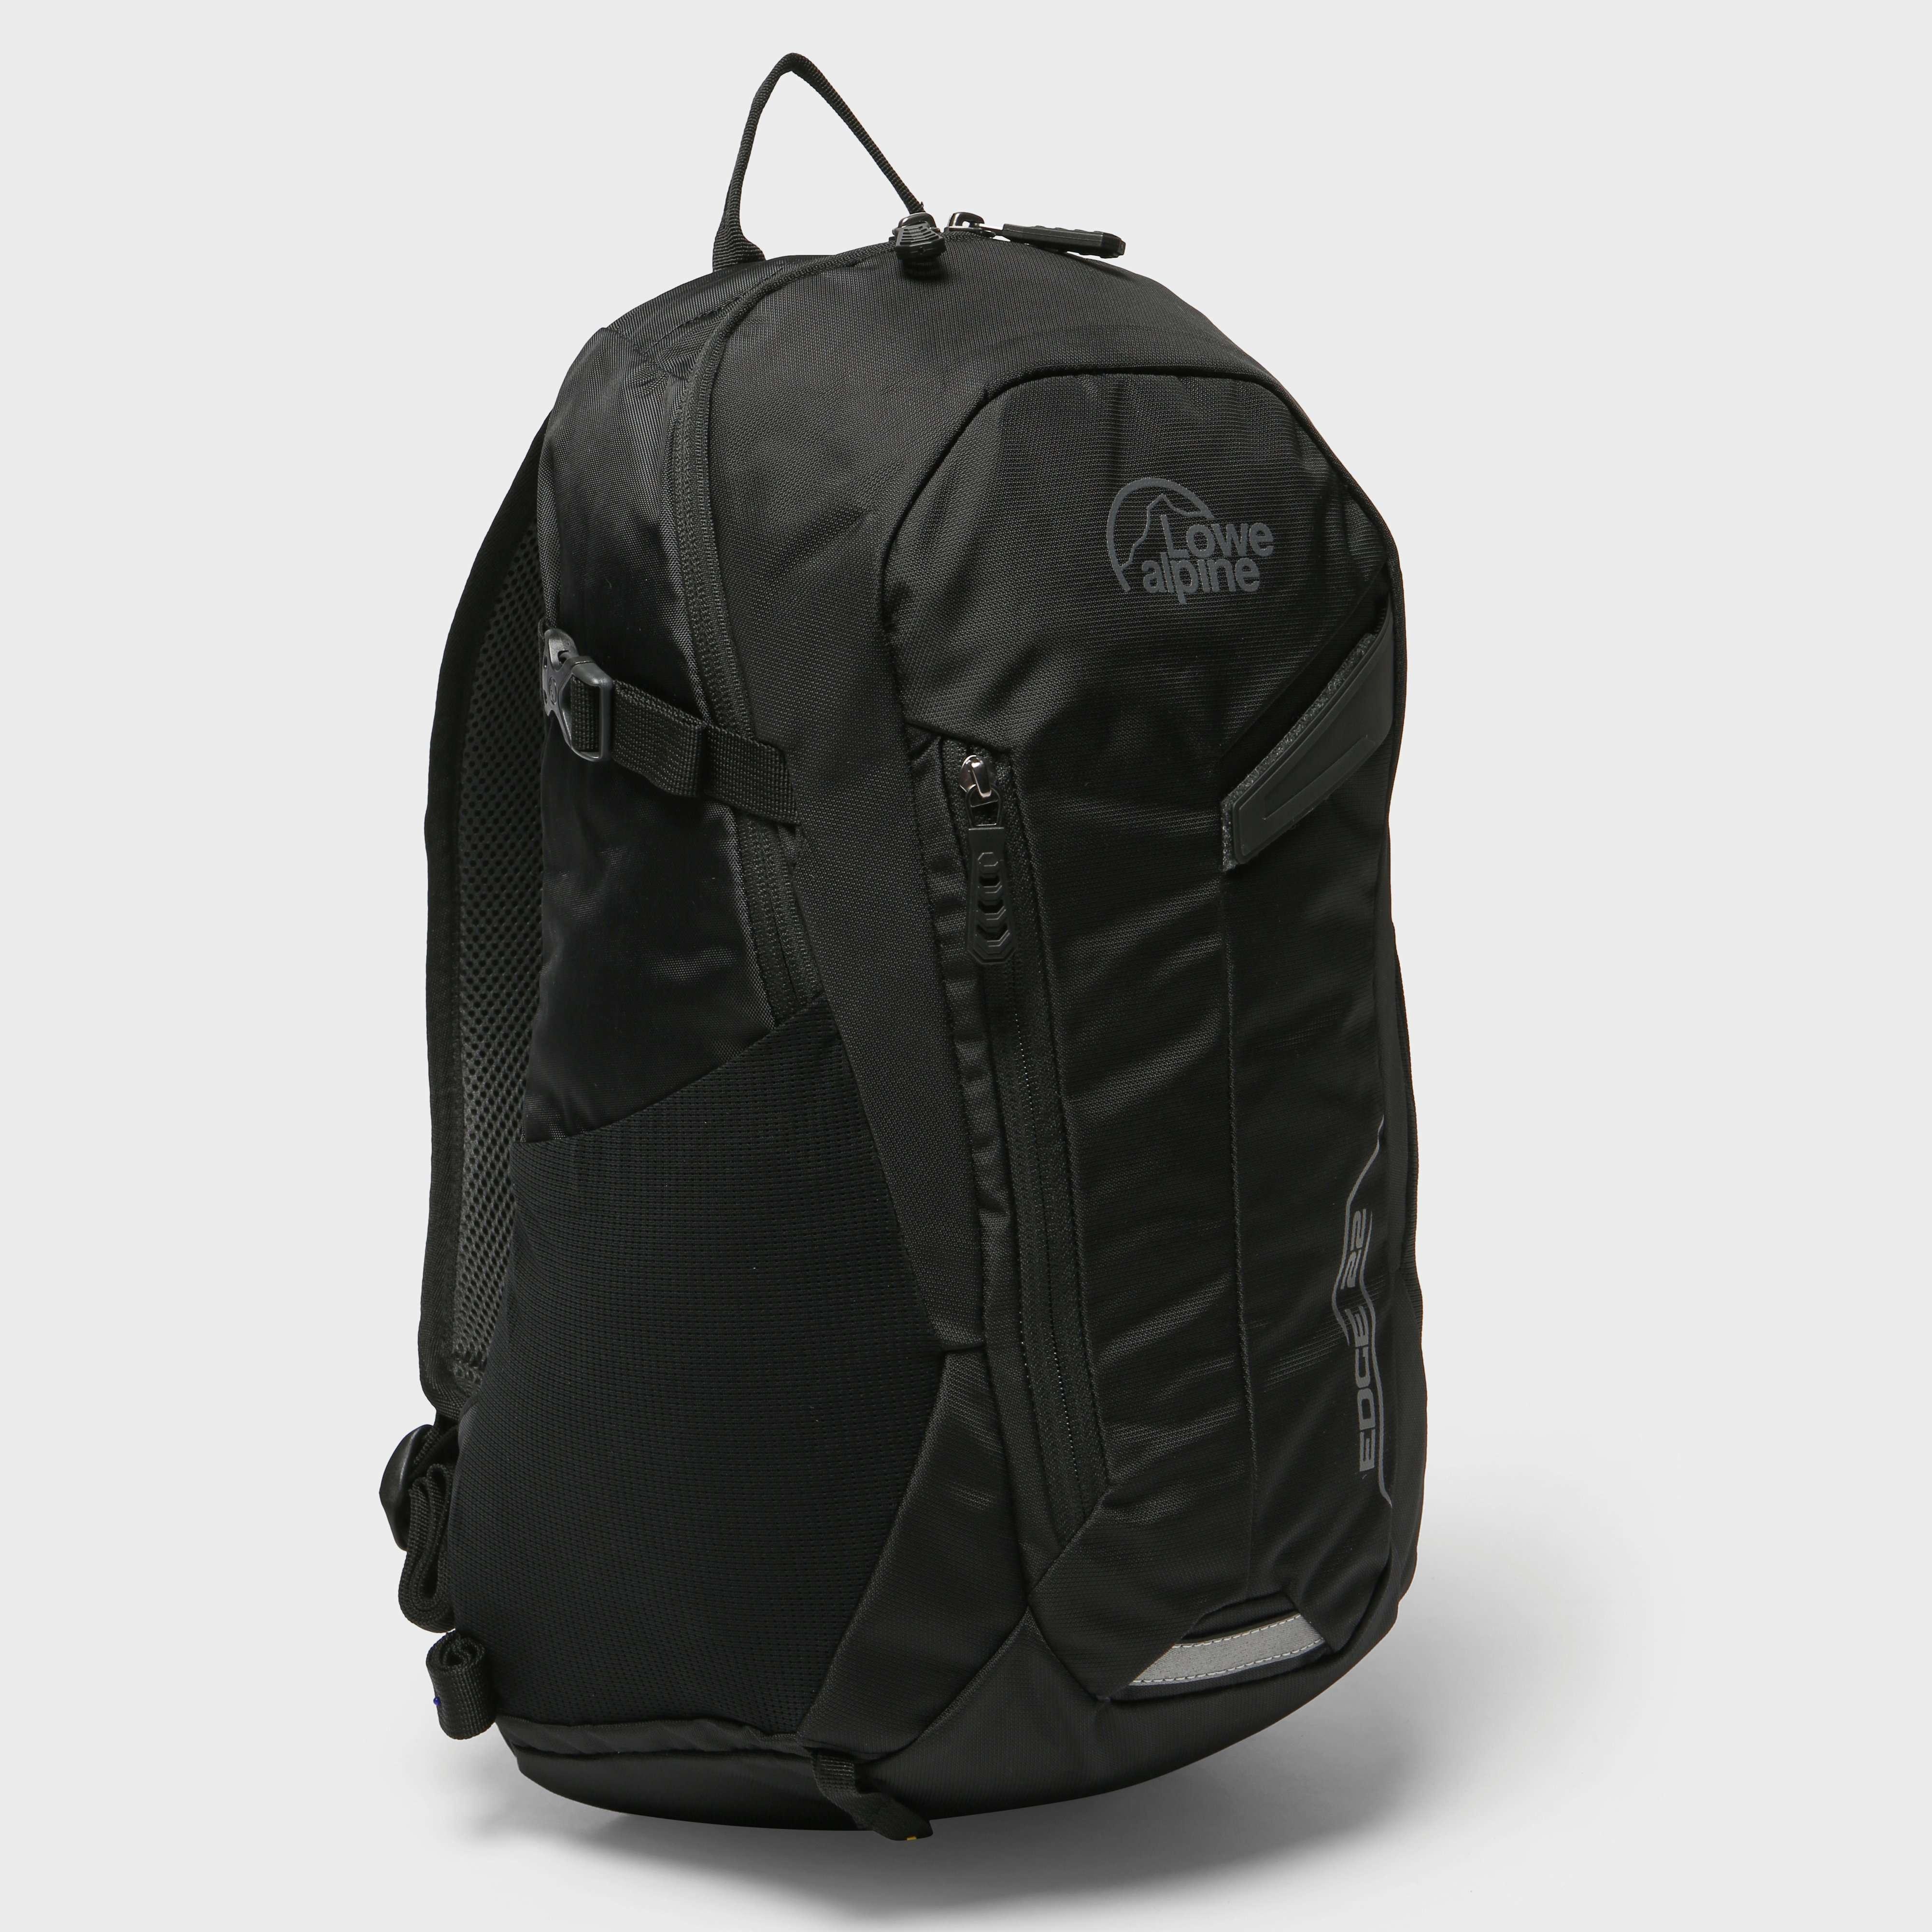 LOWE ALPINE Edge II 22 Daypack